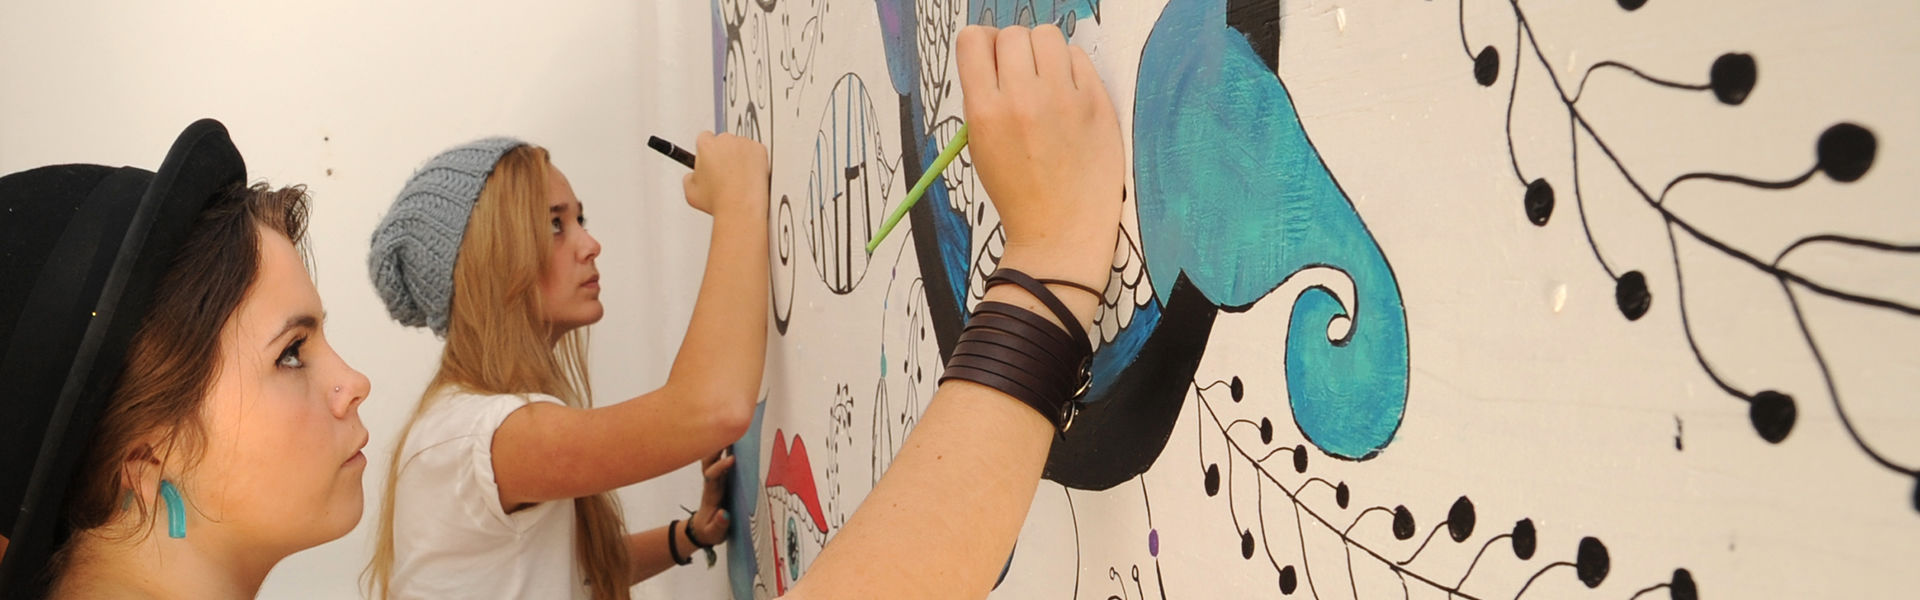 Marbella Design Academy - Foundation Course